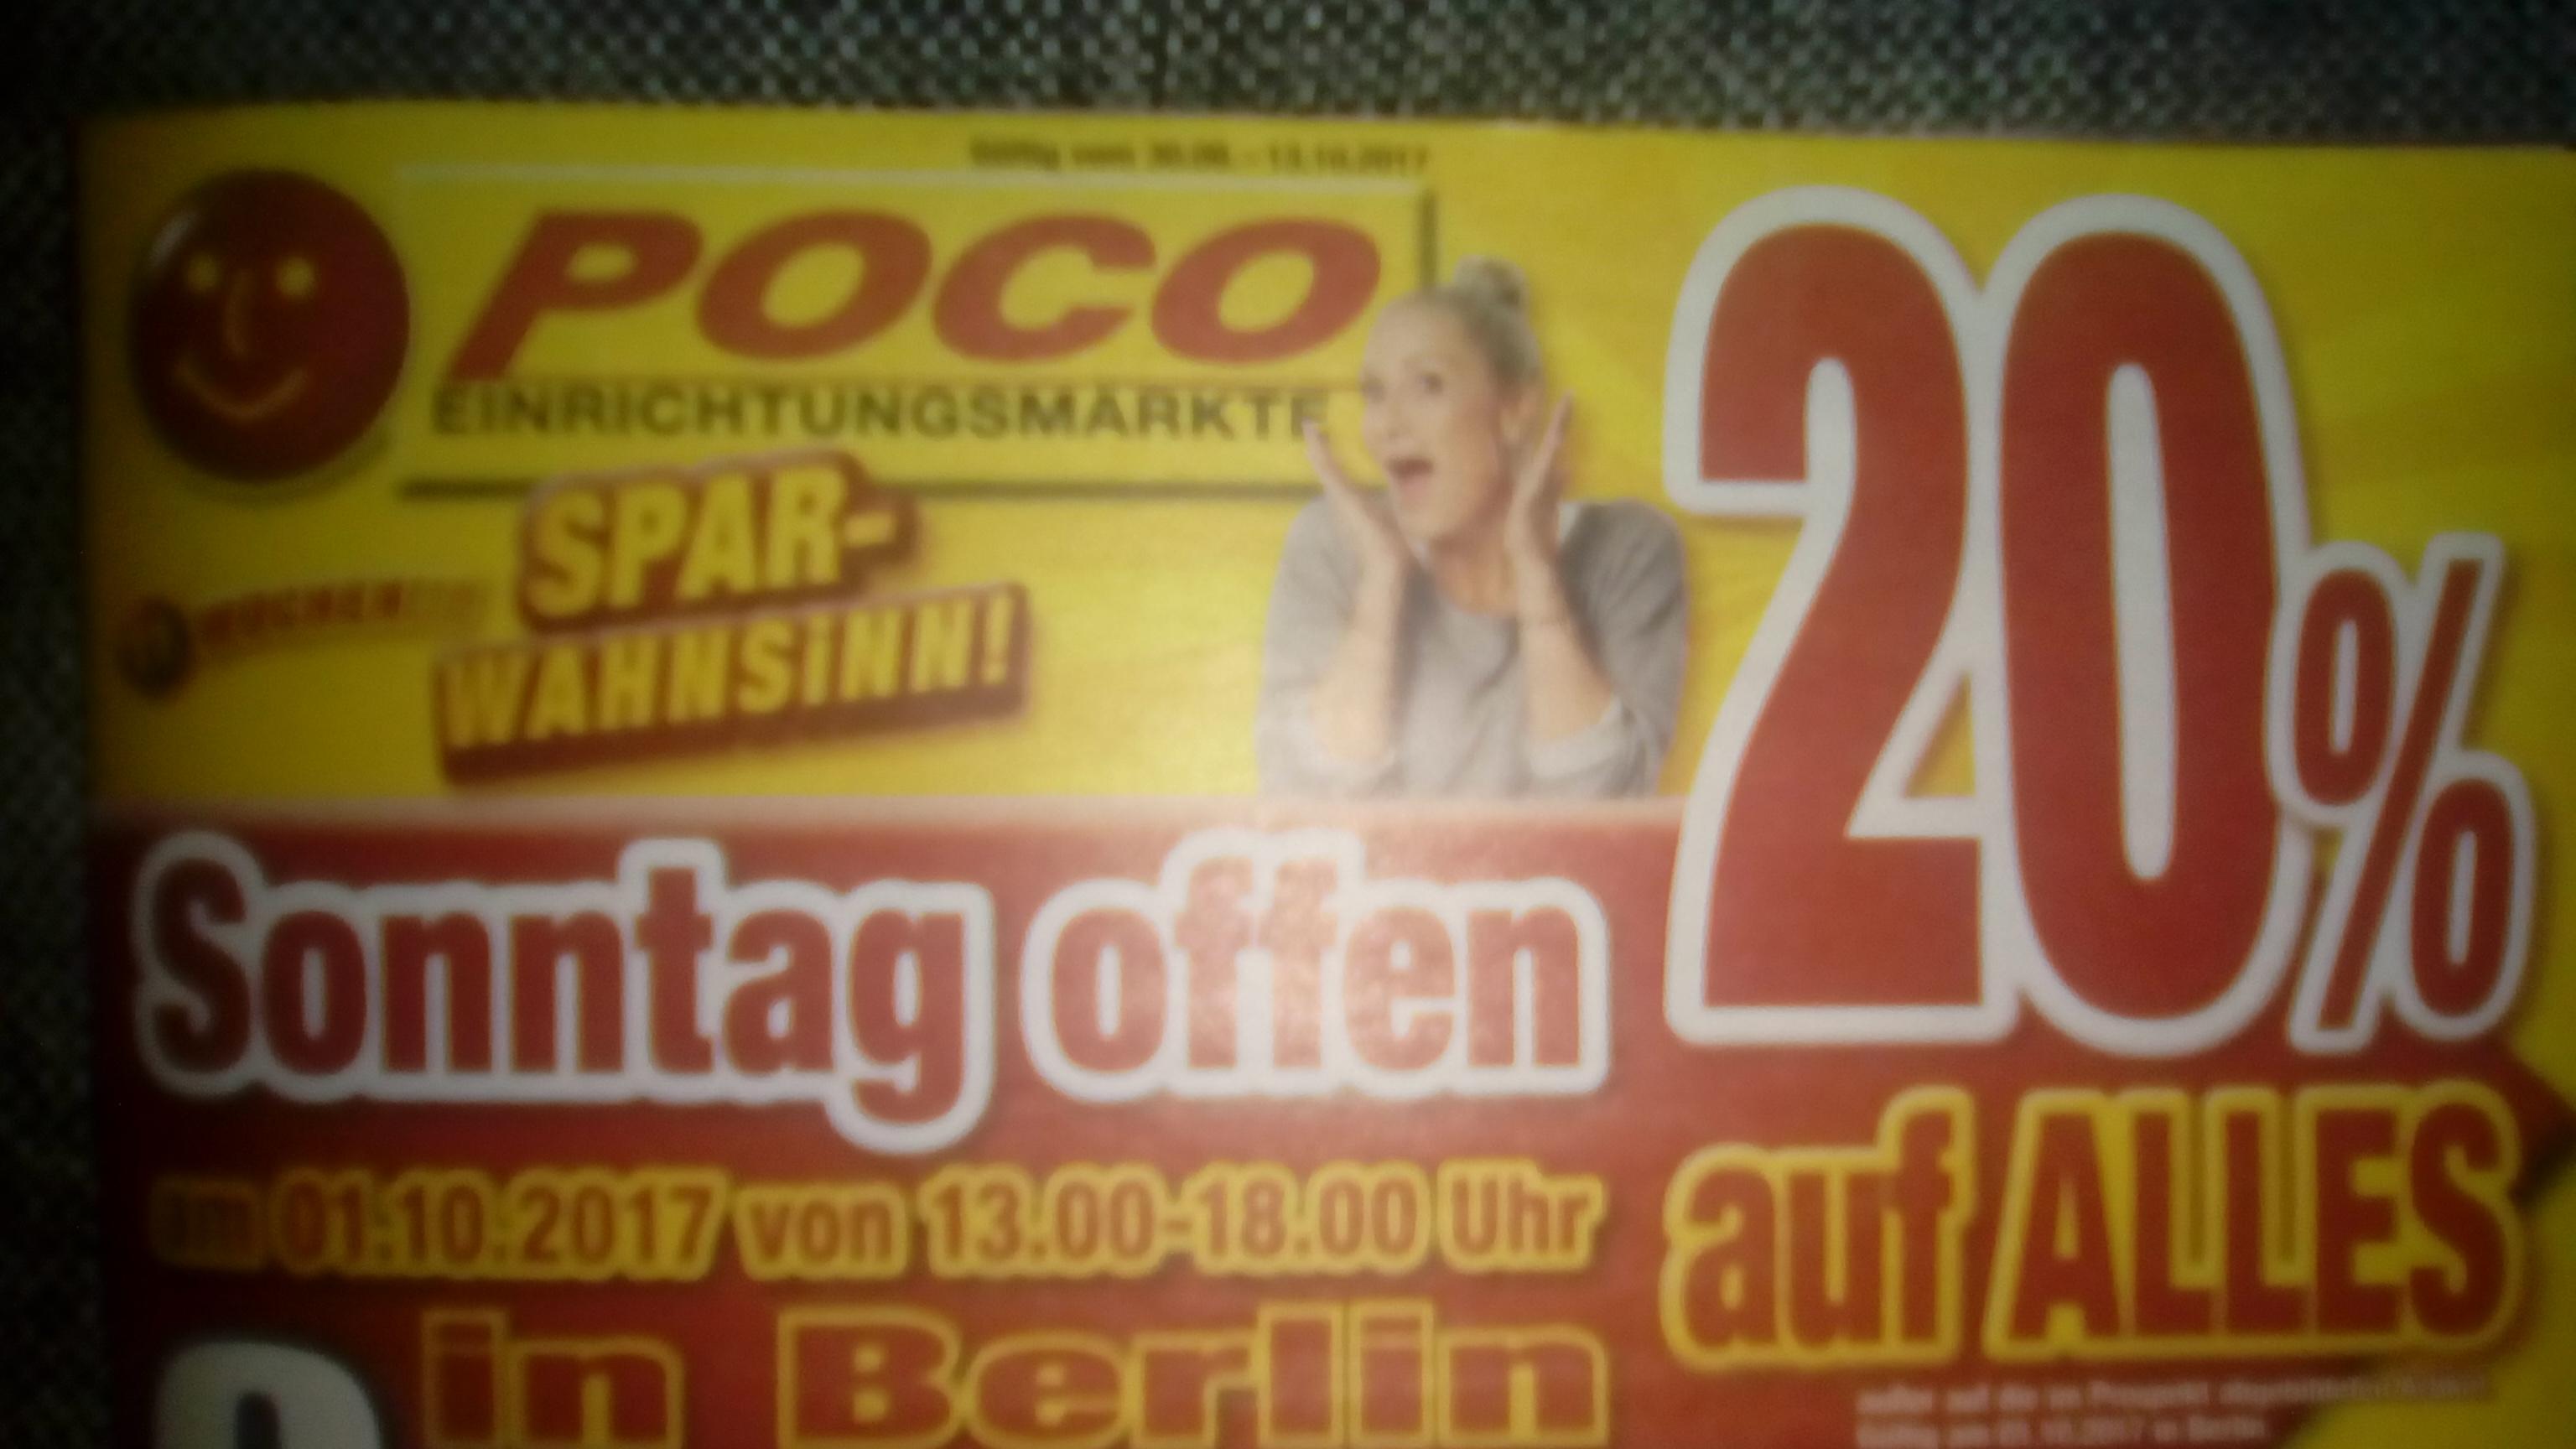 -Lokal Berlin- 20% Bei Poco offline